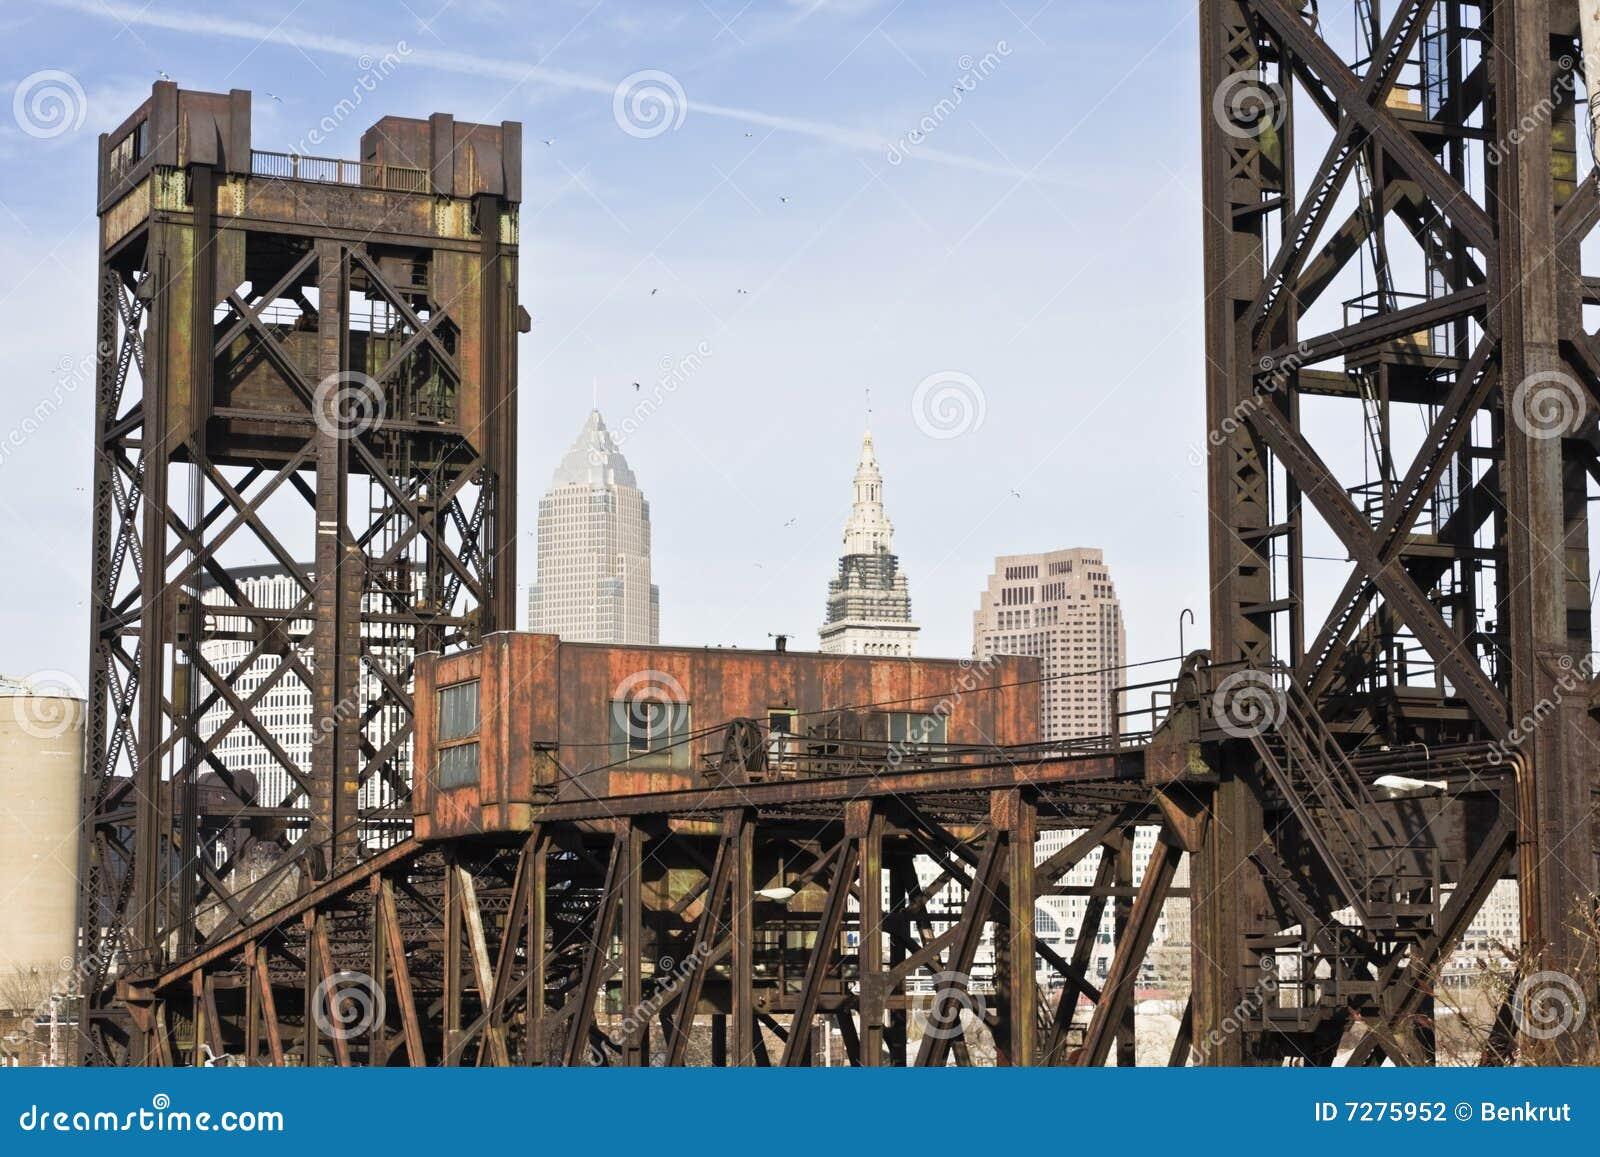 Bridge in Downtown Cleveland